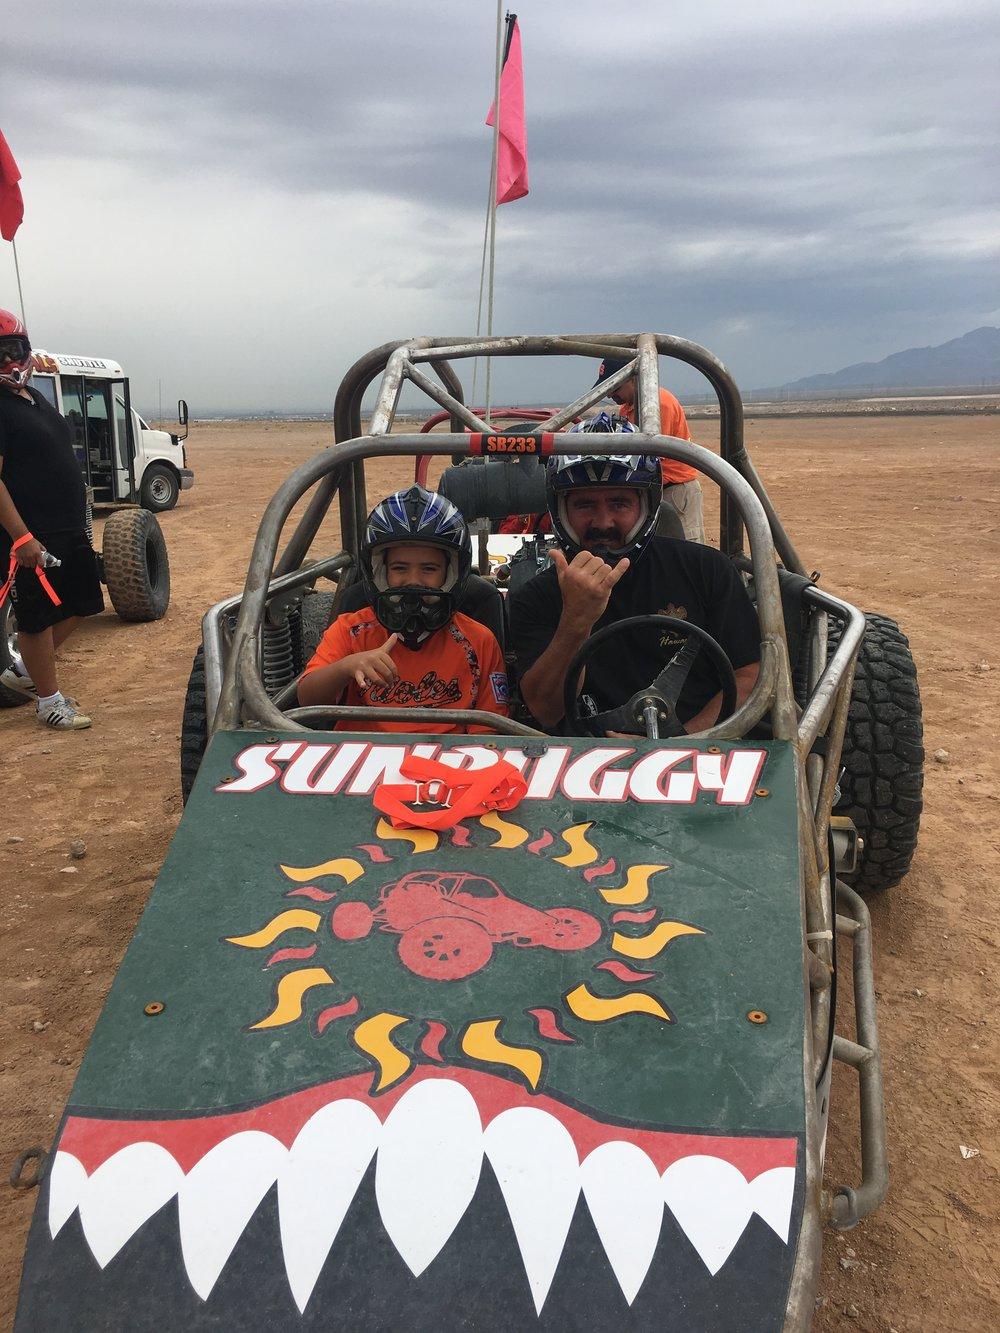 Desert buggy adventure